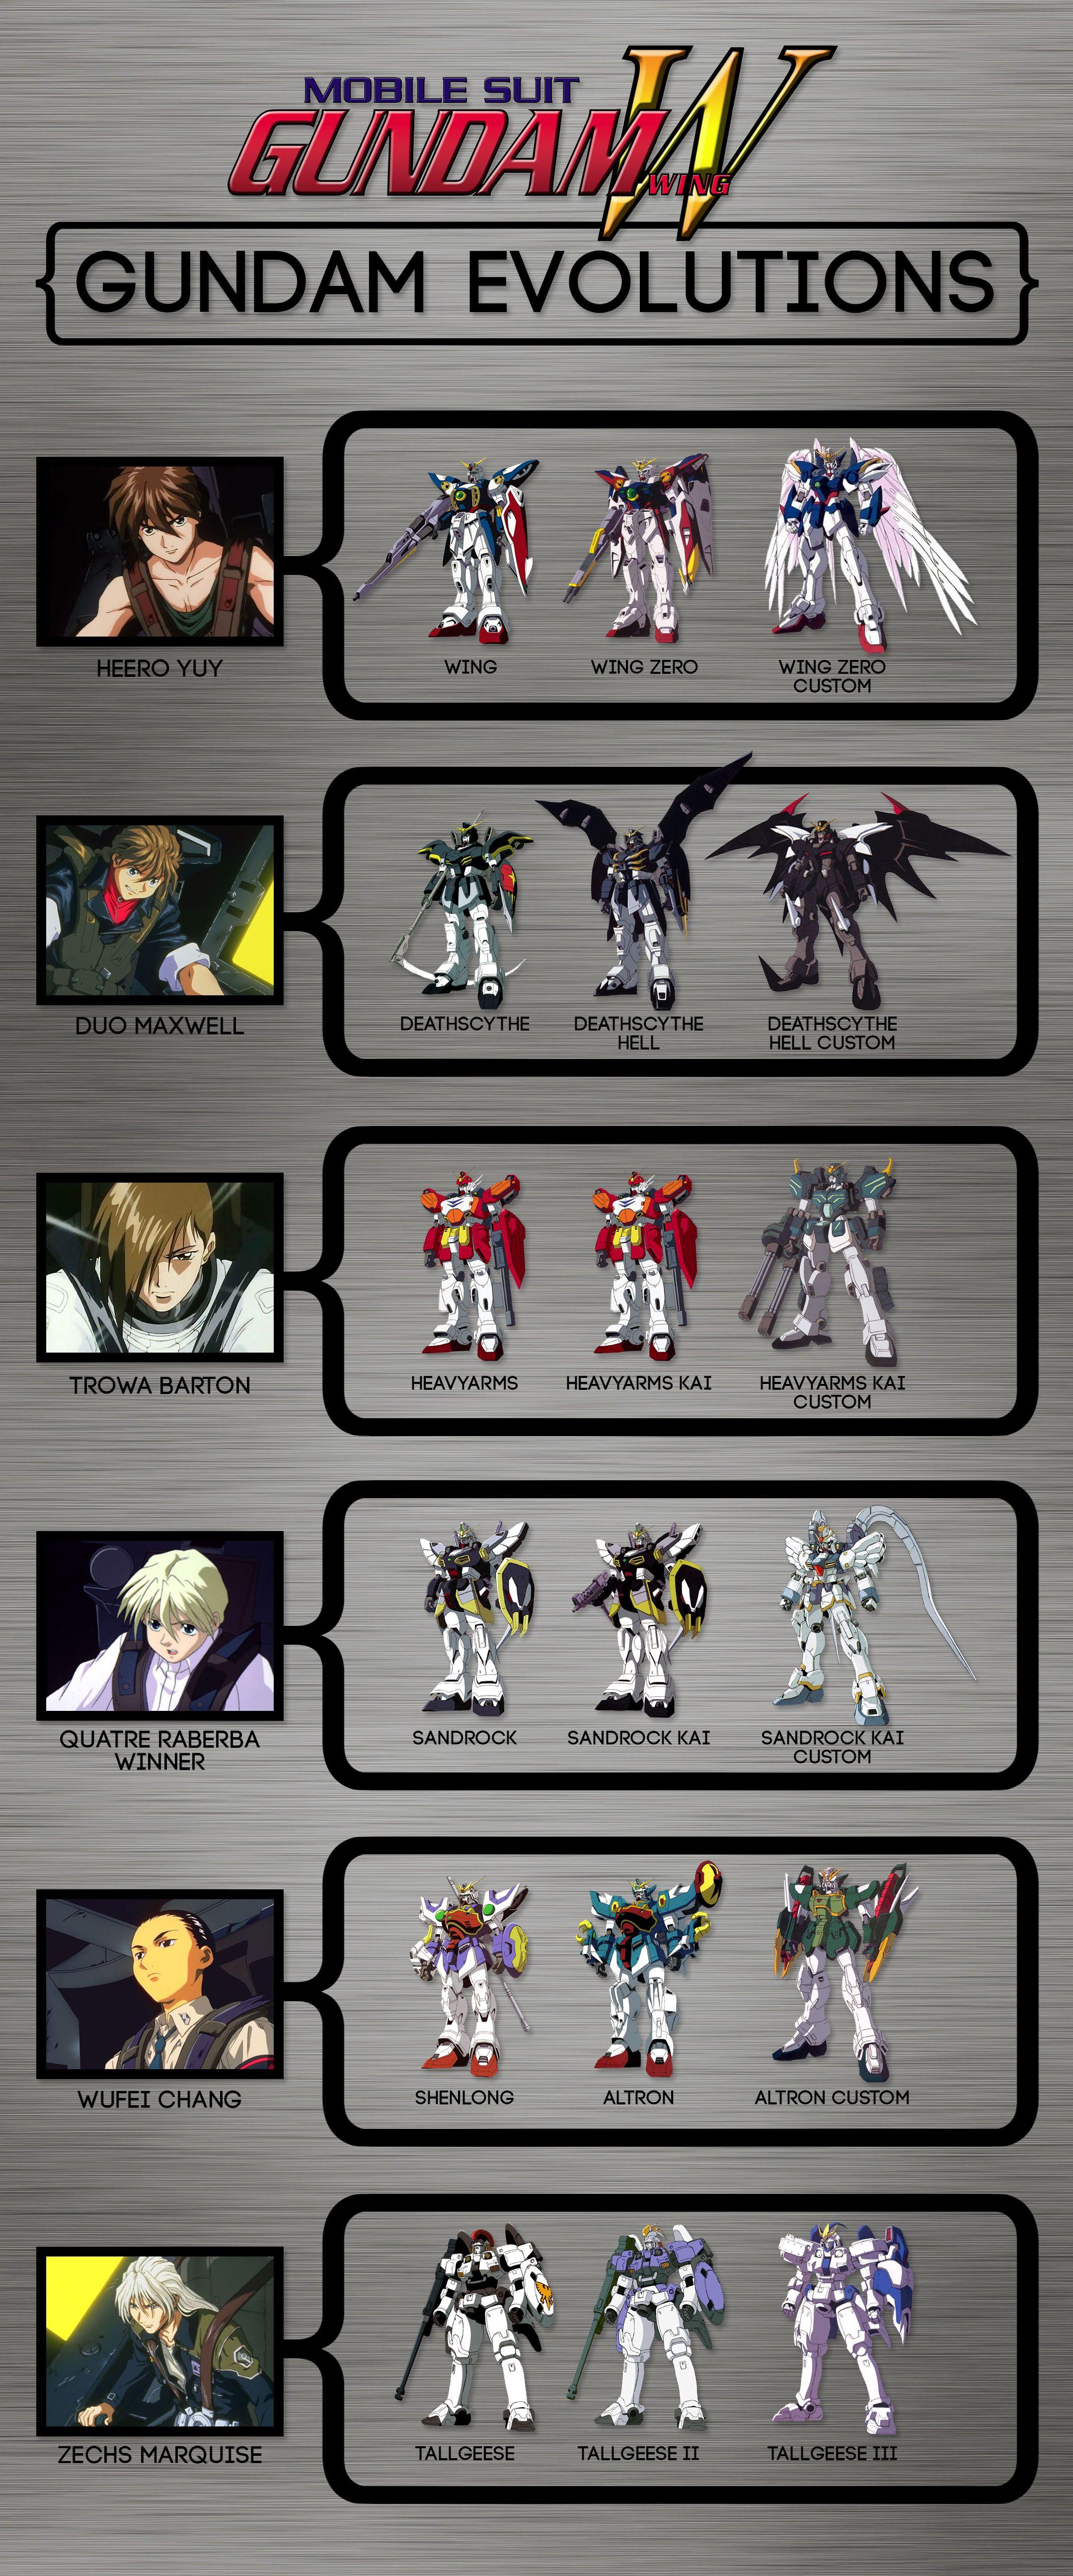 Gundam Wing — Gundam Evolutions Gundam art, Mobile suit